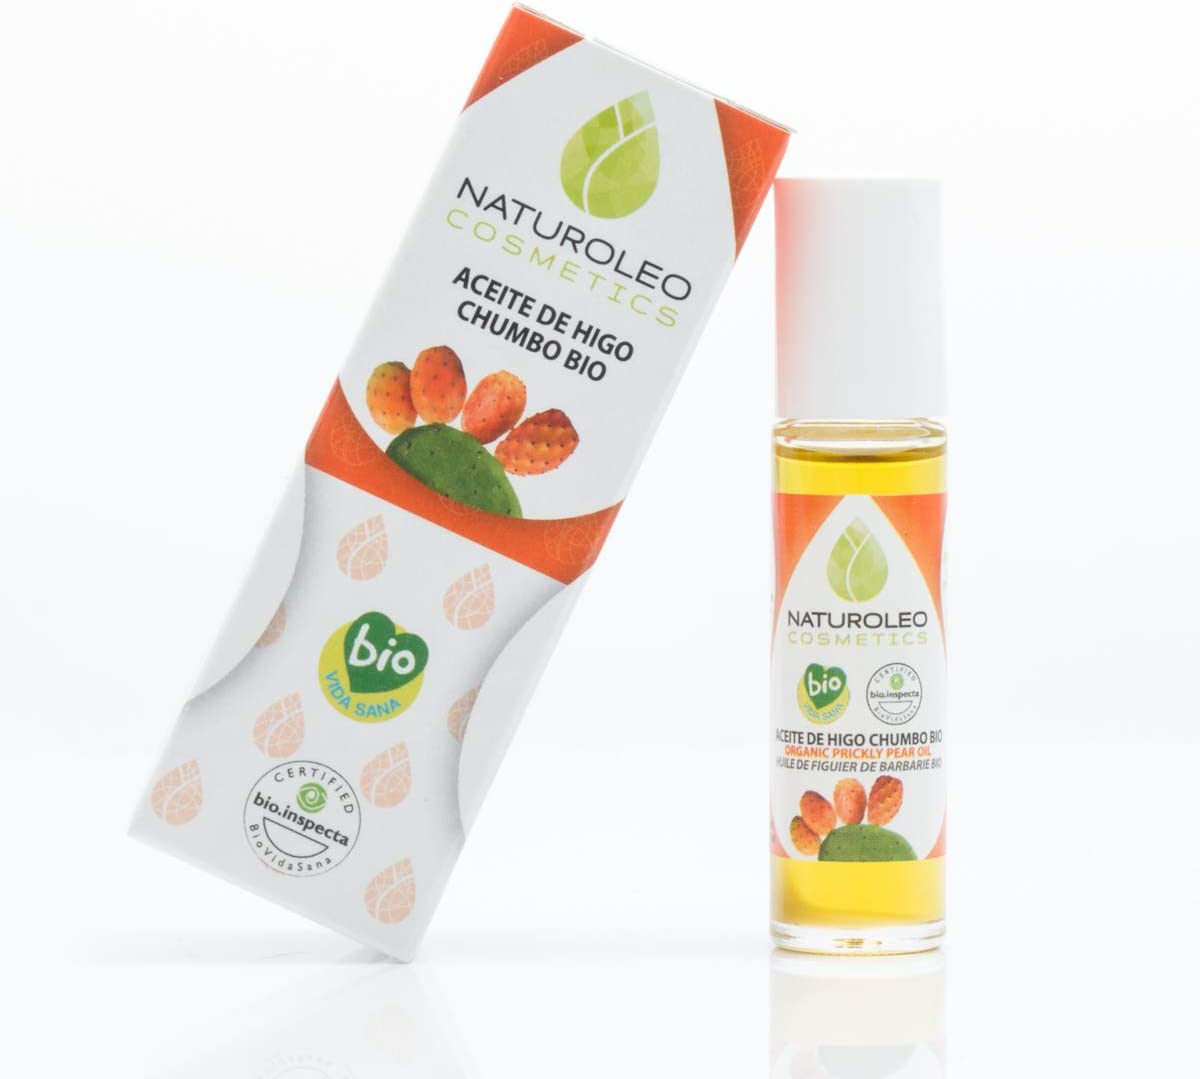 Naturoleo Cosmetics - Aceite Higo Chumbo BIO - 100% Puro y Natural Ecológico Certificado - 10 ml.